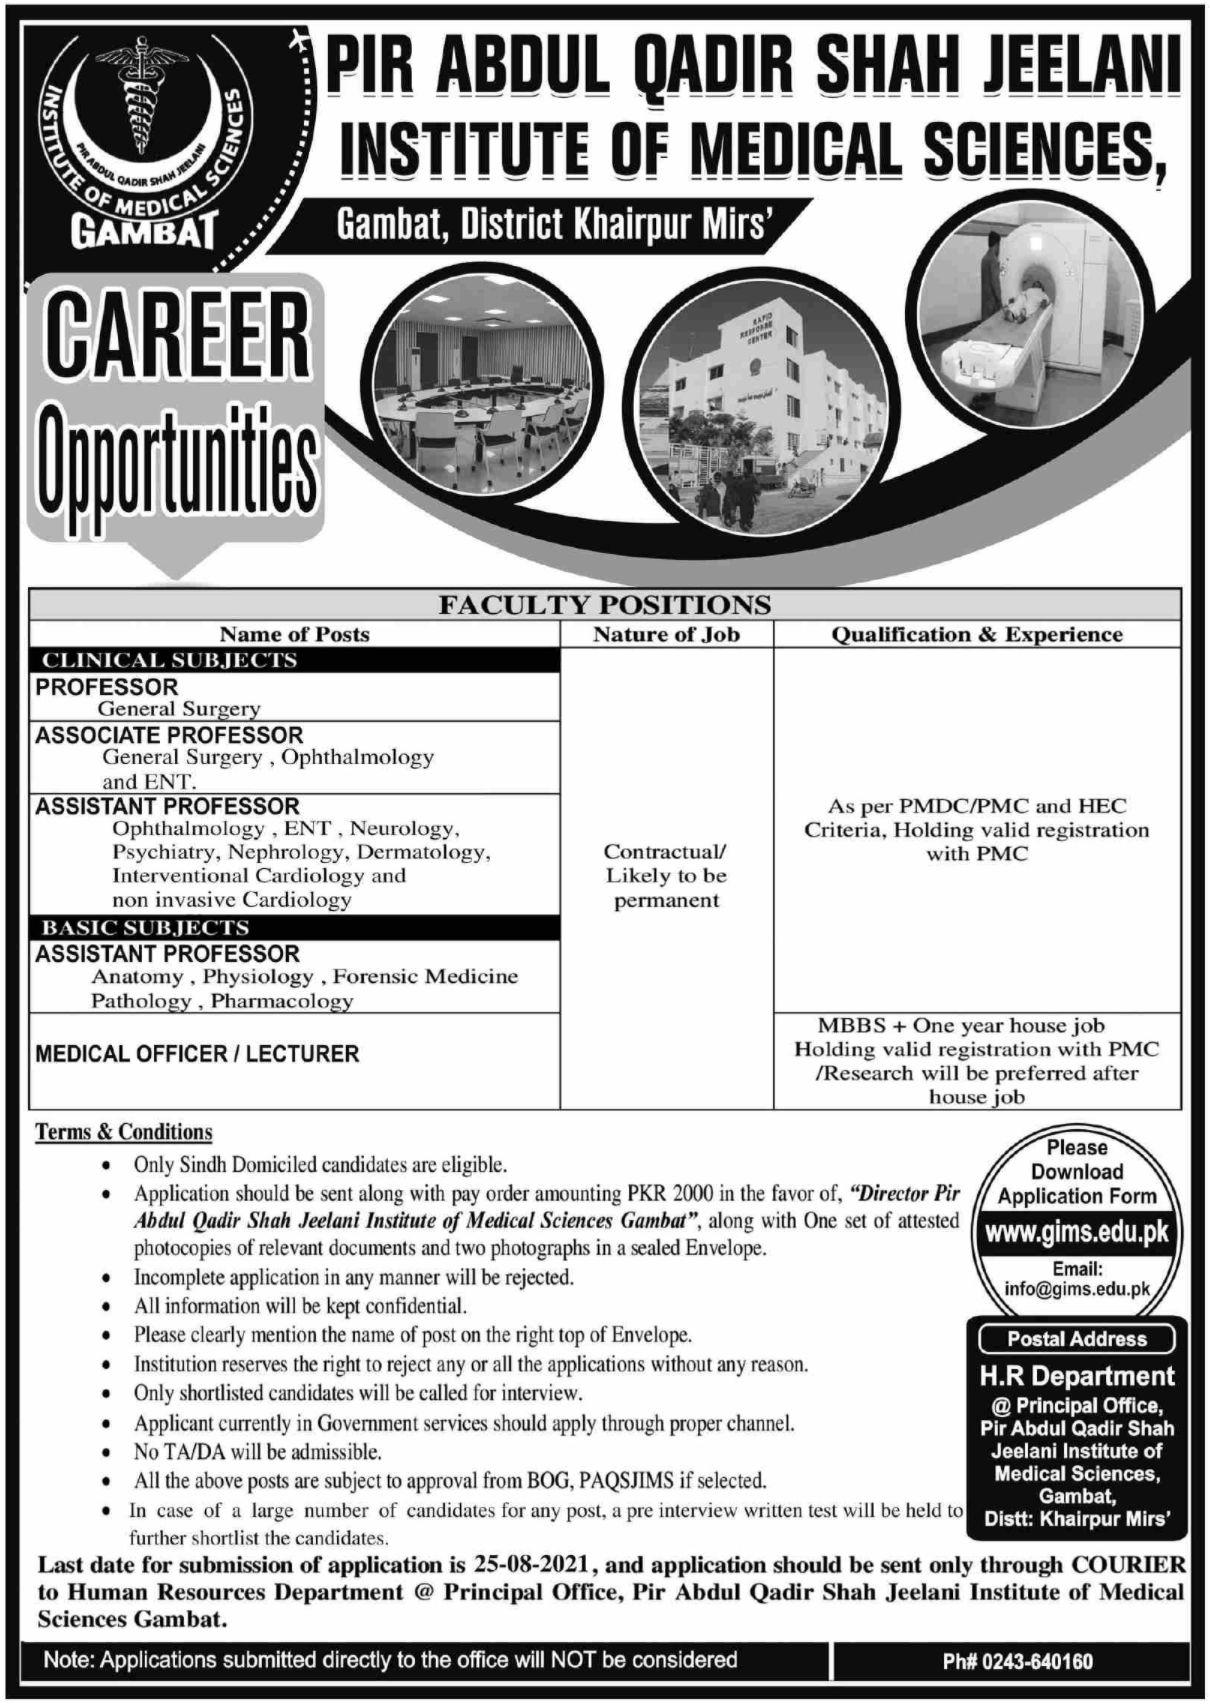 PIR Abdul Qadir Shah Jeelani Institute of Medical Sciences Vacancies 2021 3